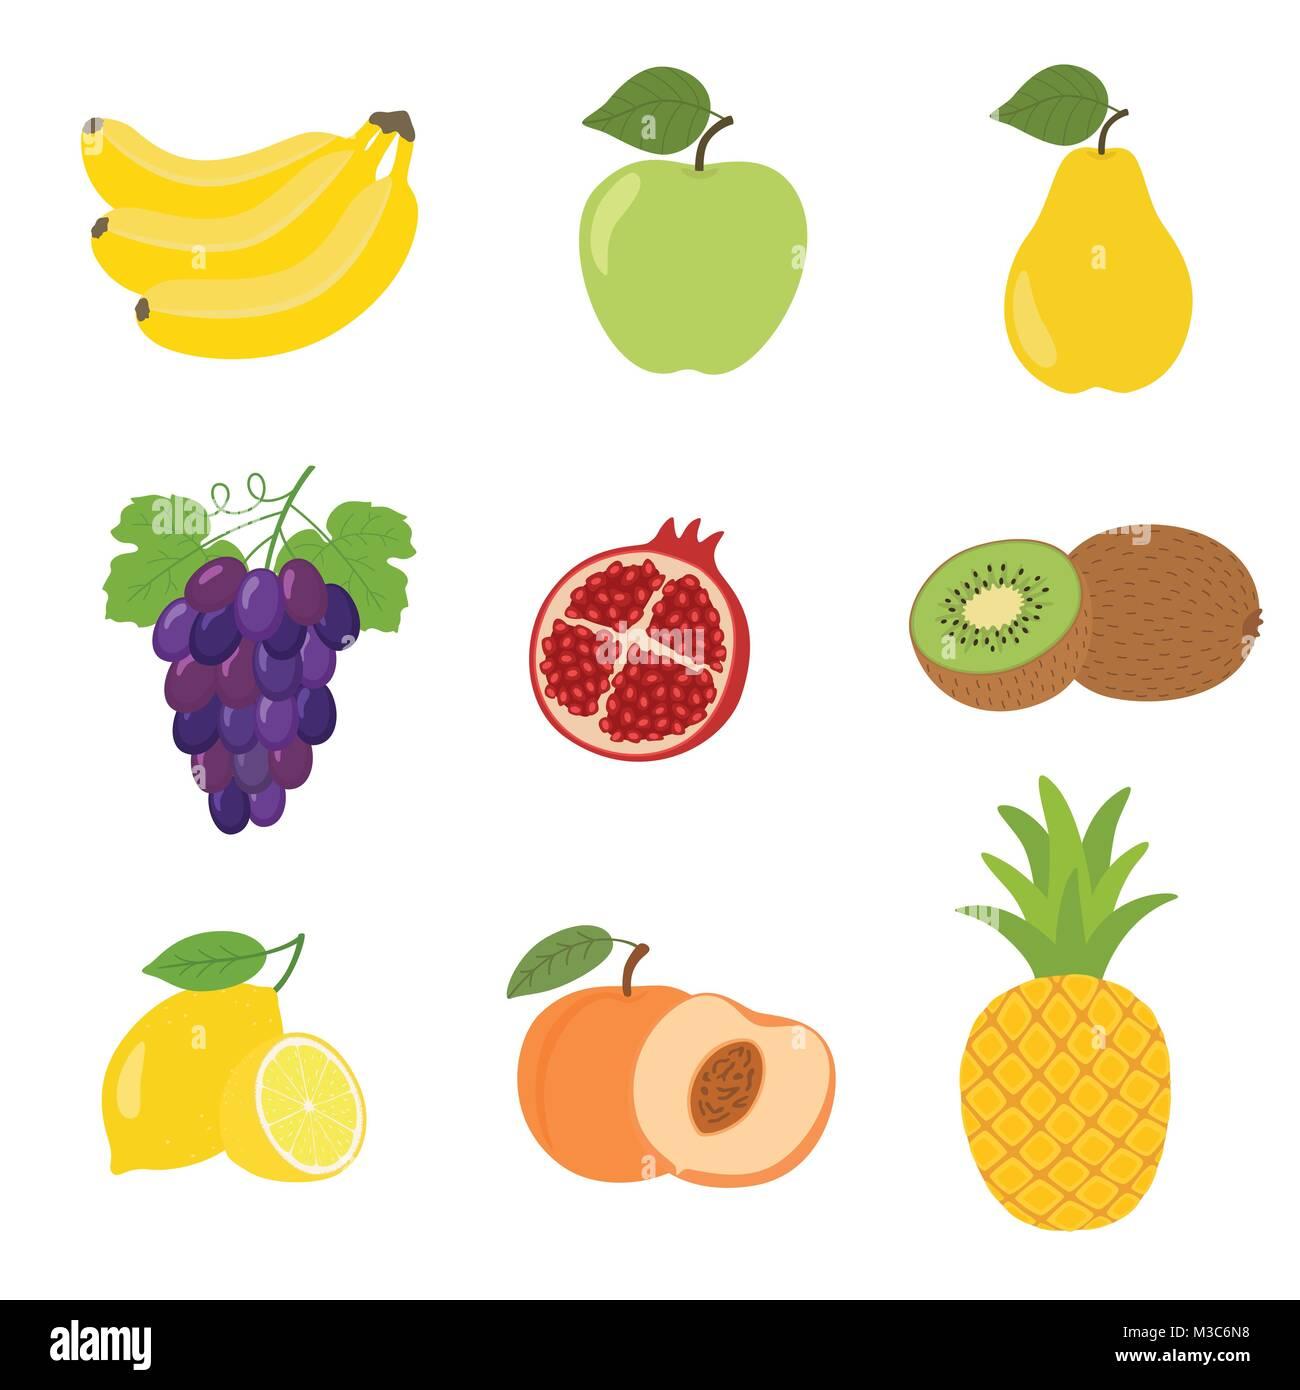 conjunto de coloridos dibujos animados iconos de fruta de manzana